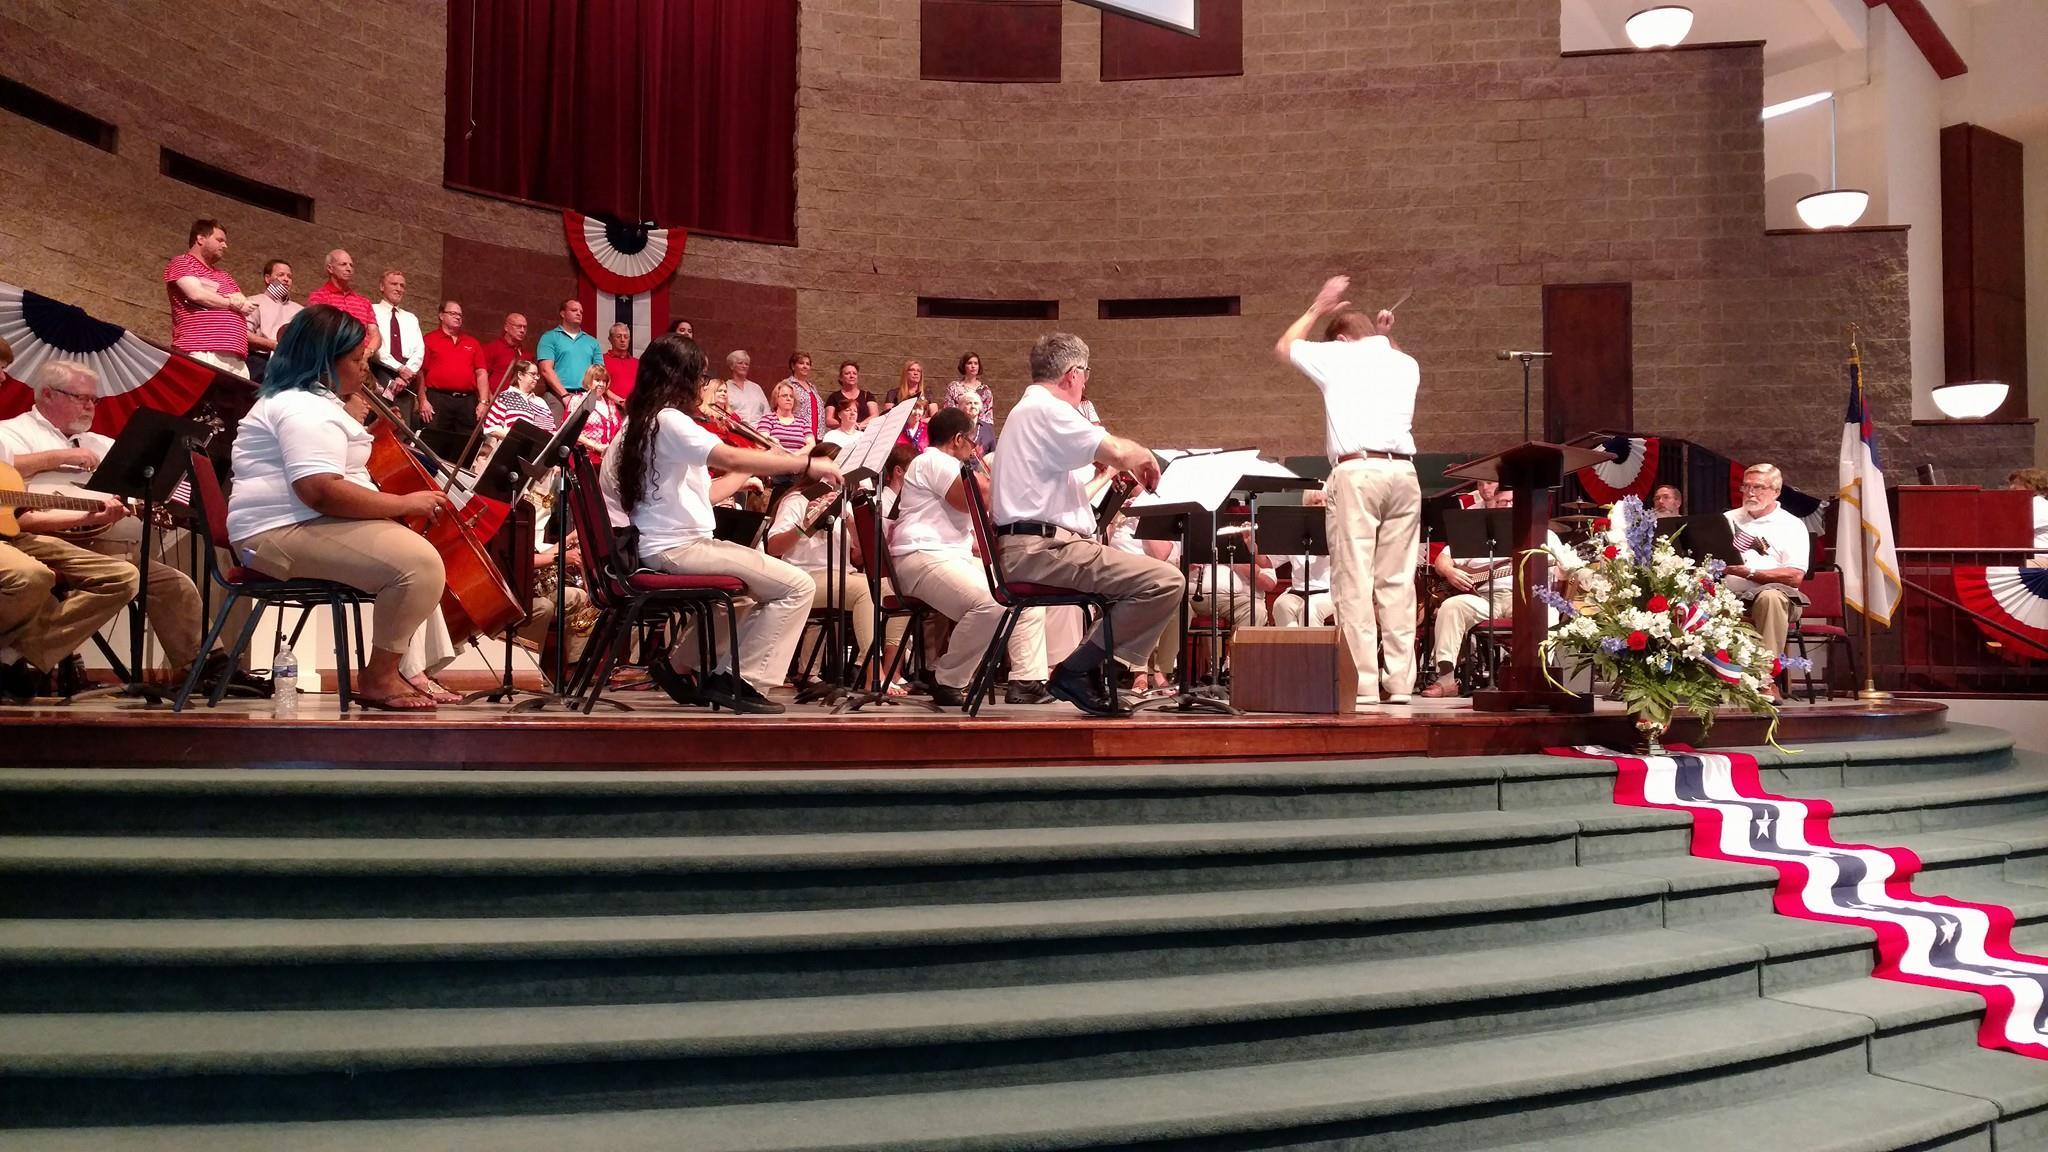 choir 4th of july 2017.jpg